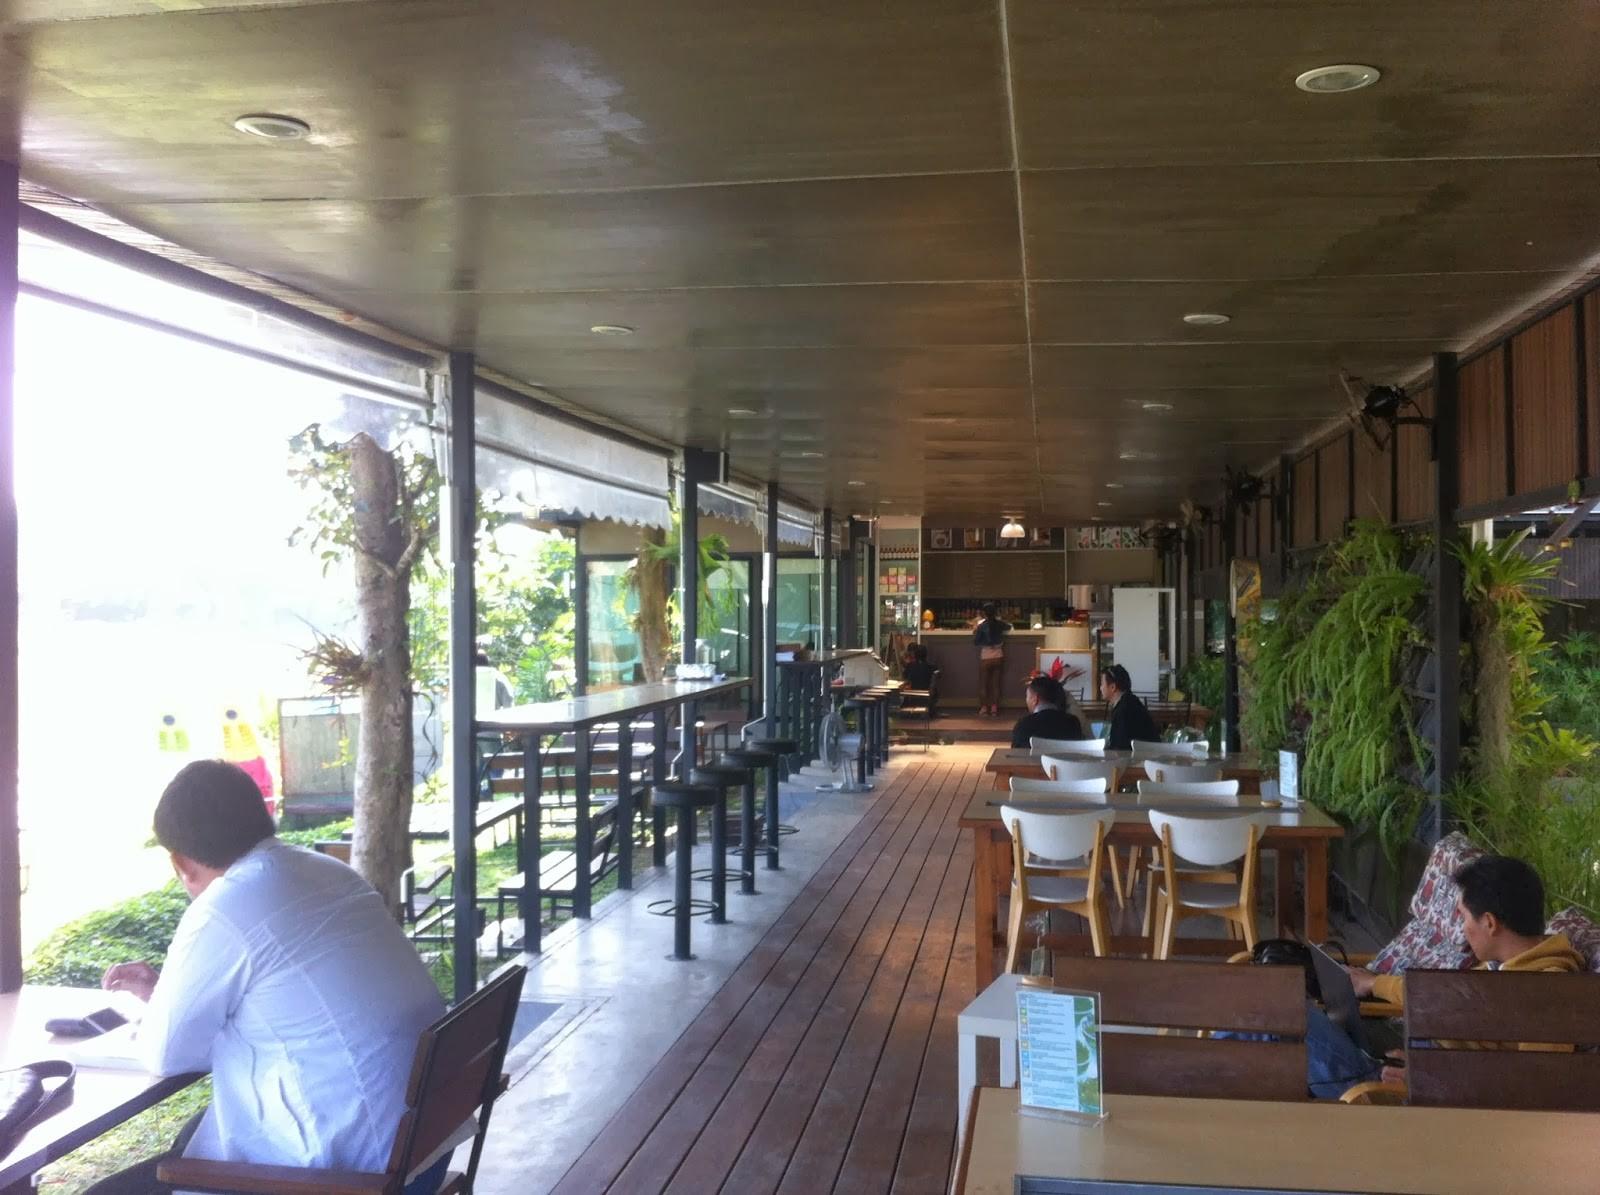 Coworking Cafe, Chiang Mai